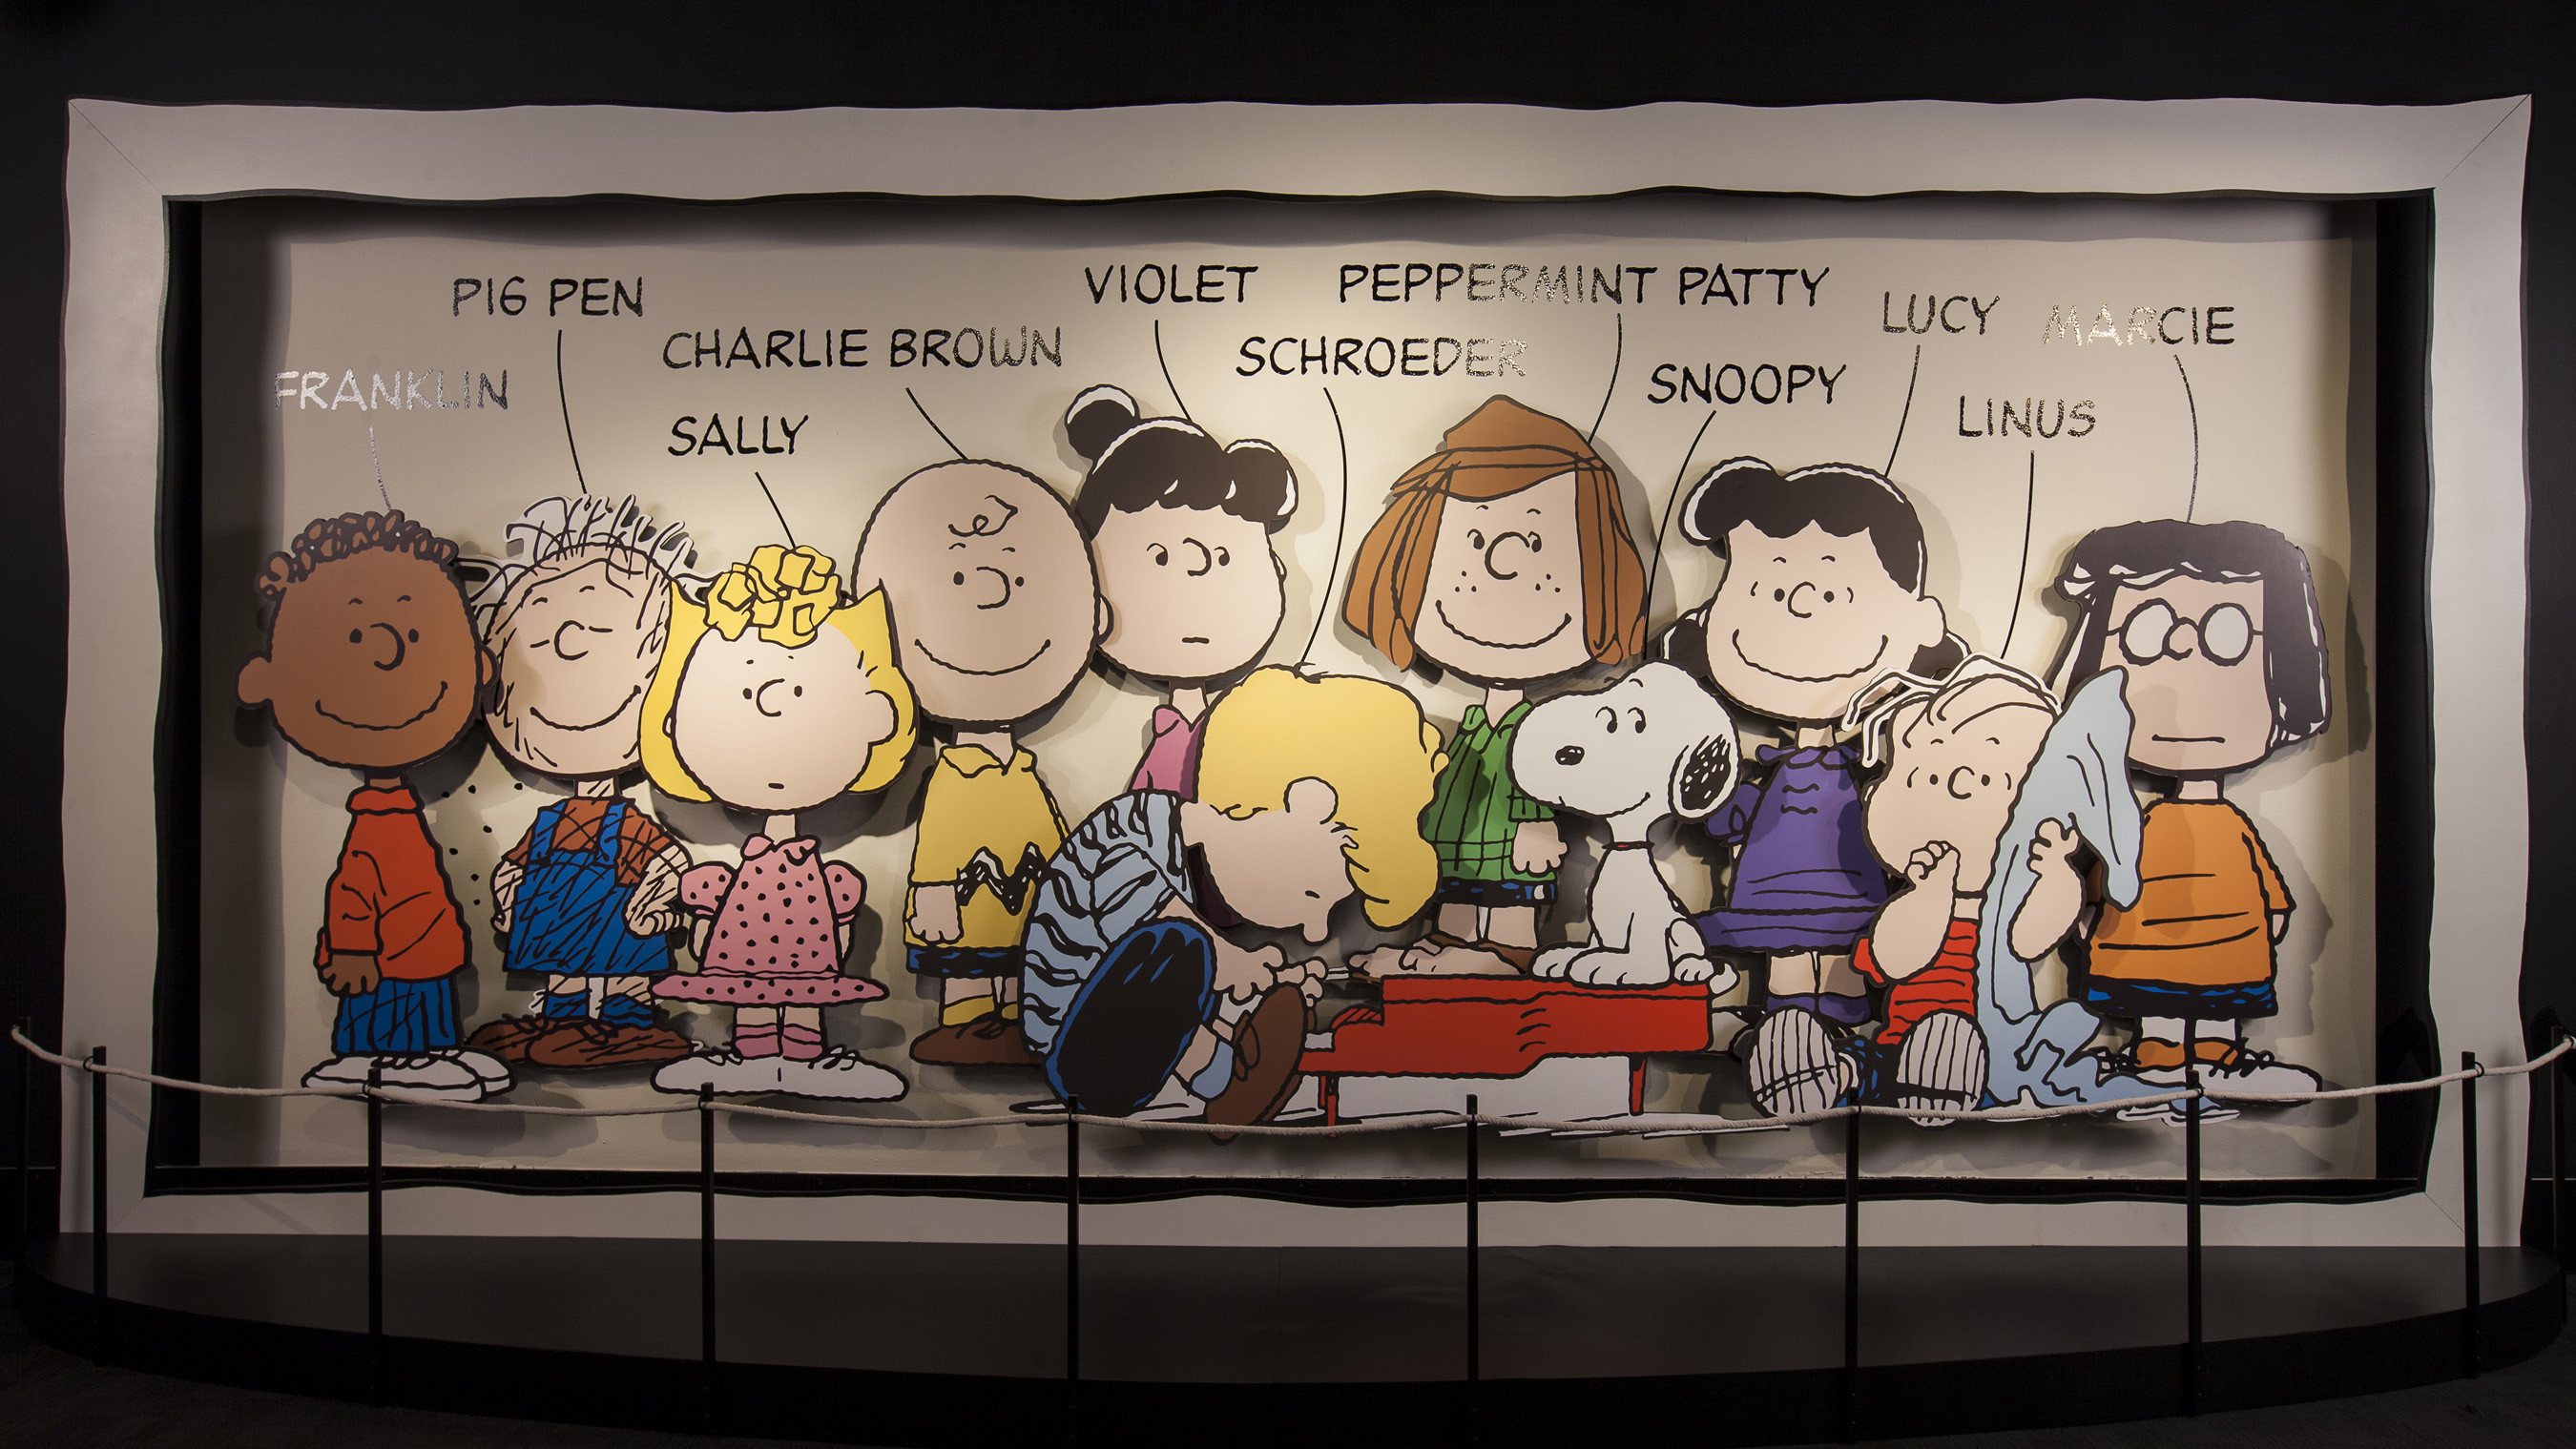 CHARLIE BROWN peanuts comics wallpaper     160969 .